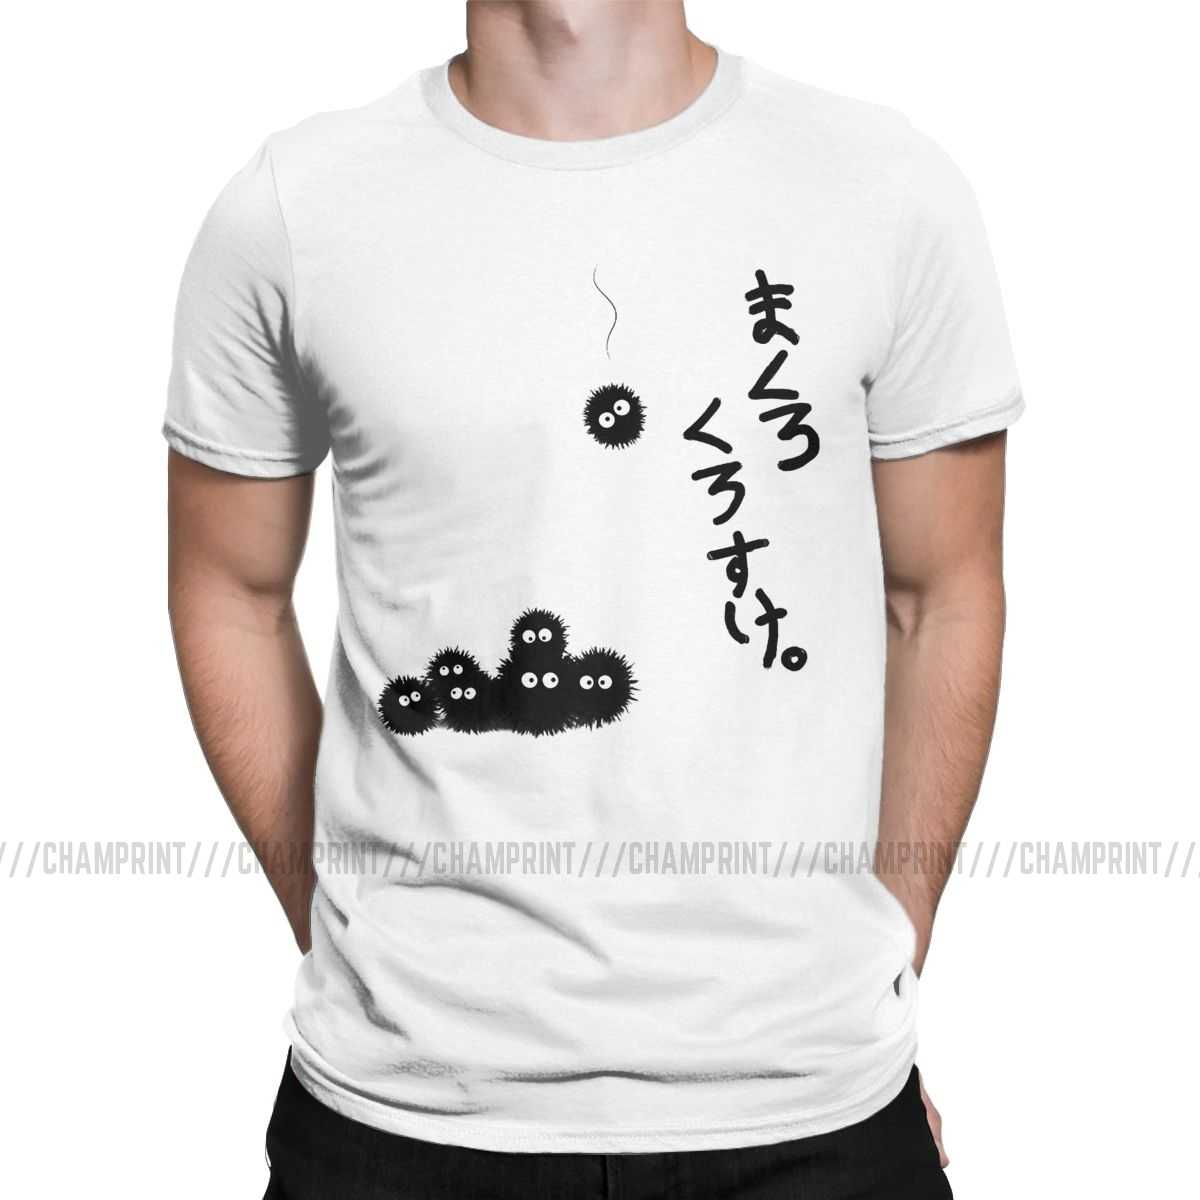 Mein Nachbar Totoro Ruß Sprites T-Shirts Männer Miyazaki Anime Japan Manga Ghibli Baumwolle T Kurzarm T Hemd Neue Ankunft tops